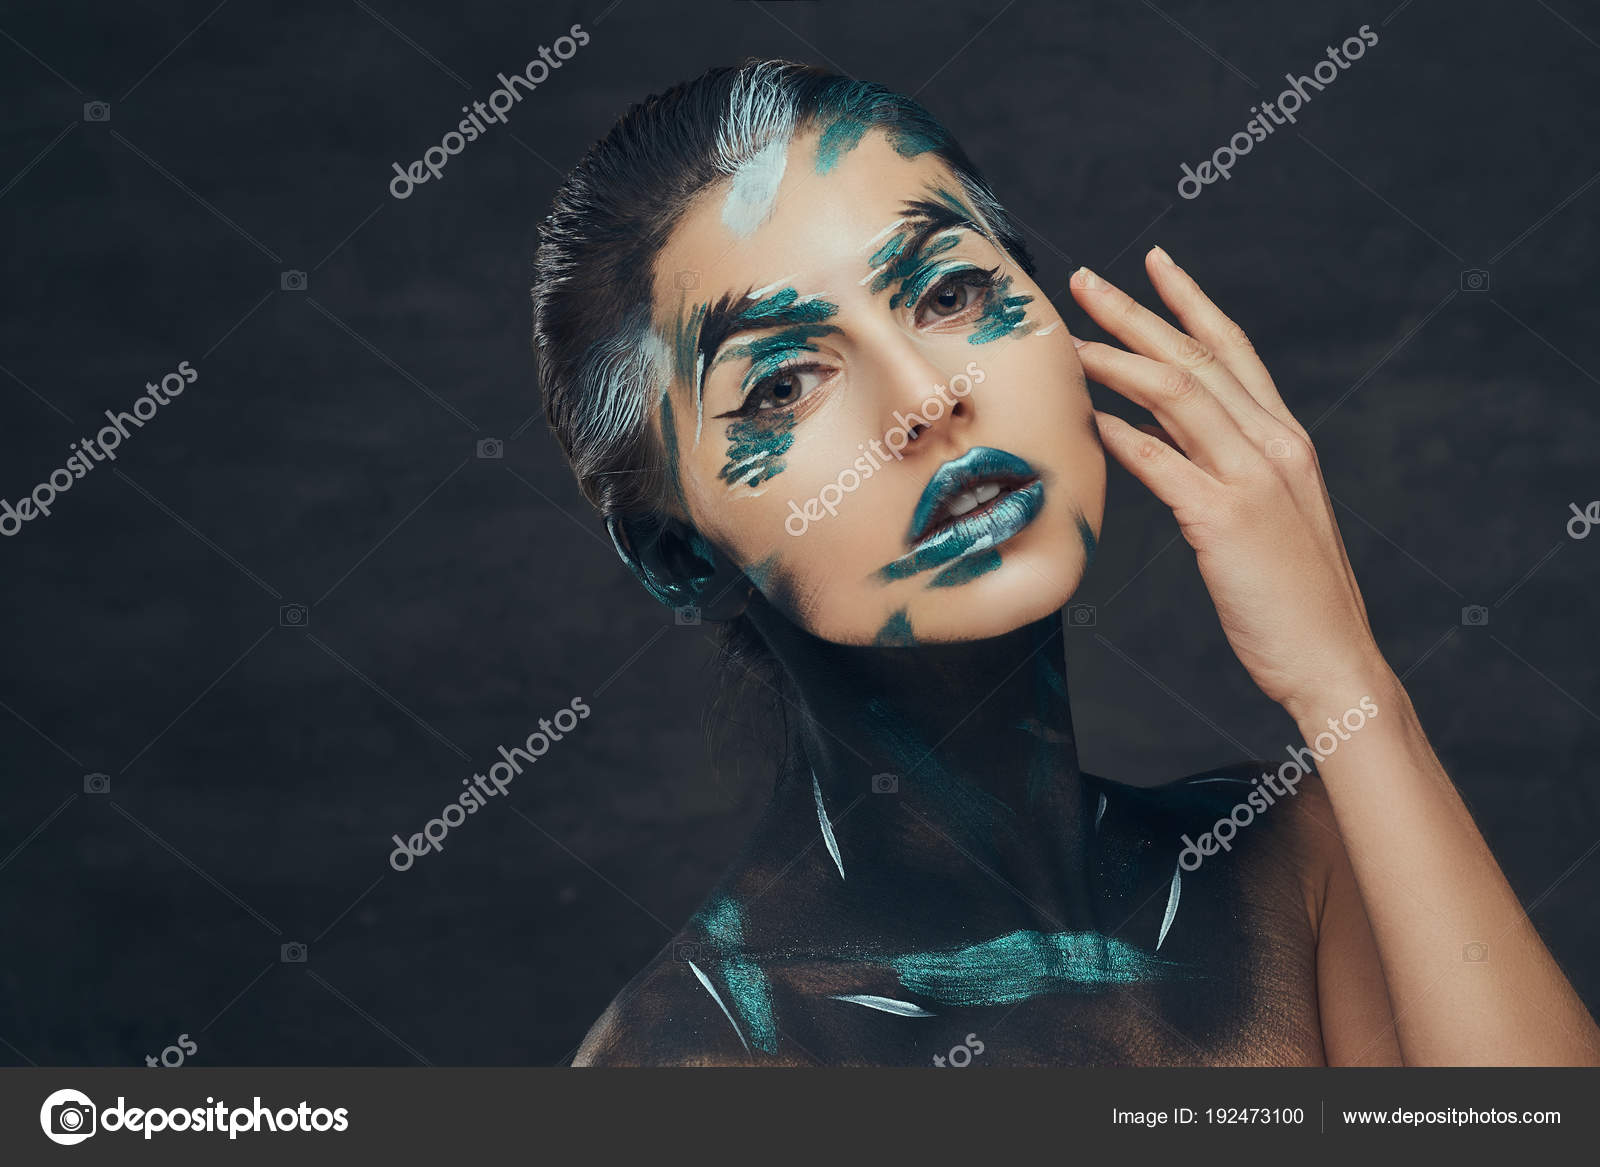 Пизда и лицо девушки на одном фото Частное фото 12